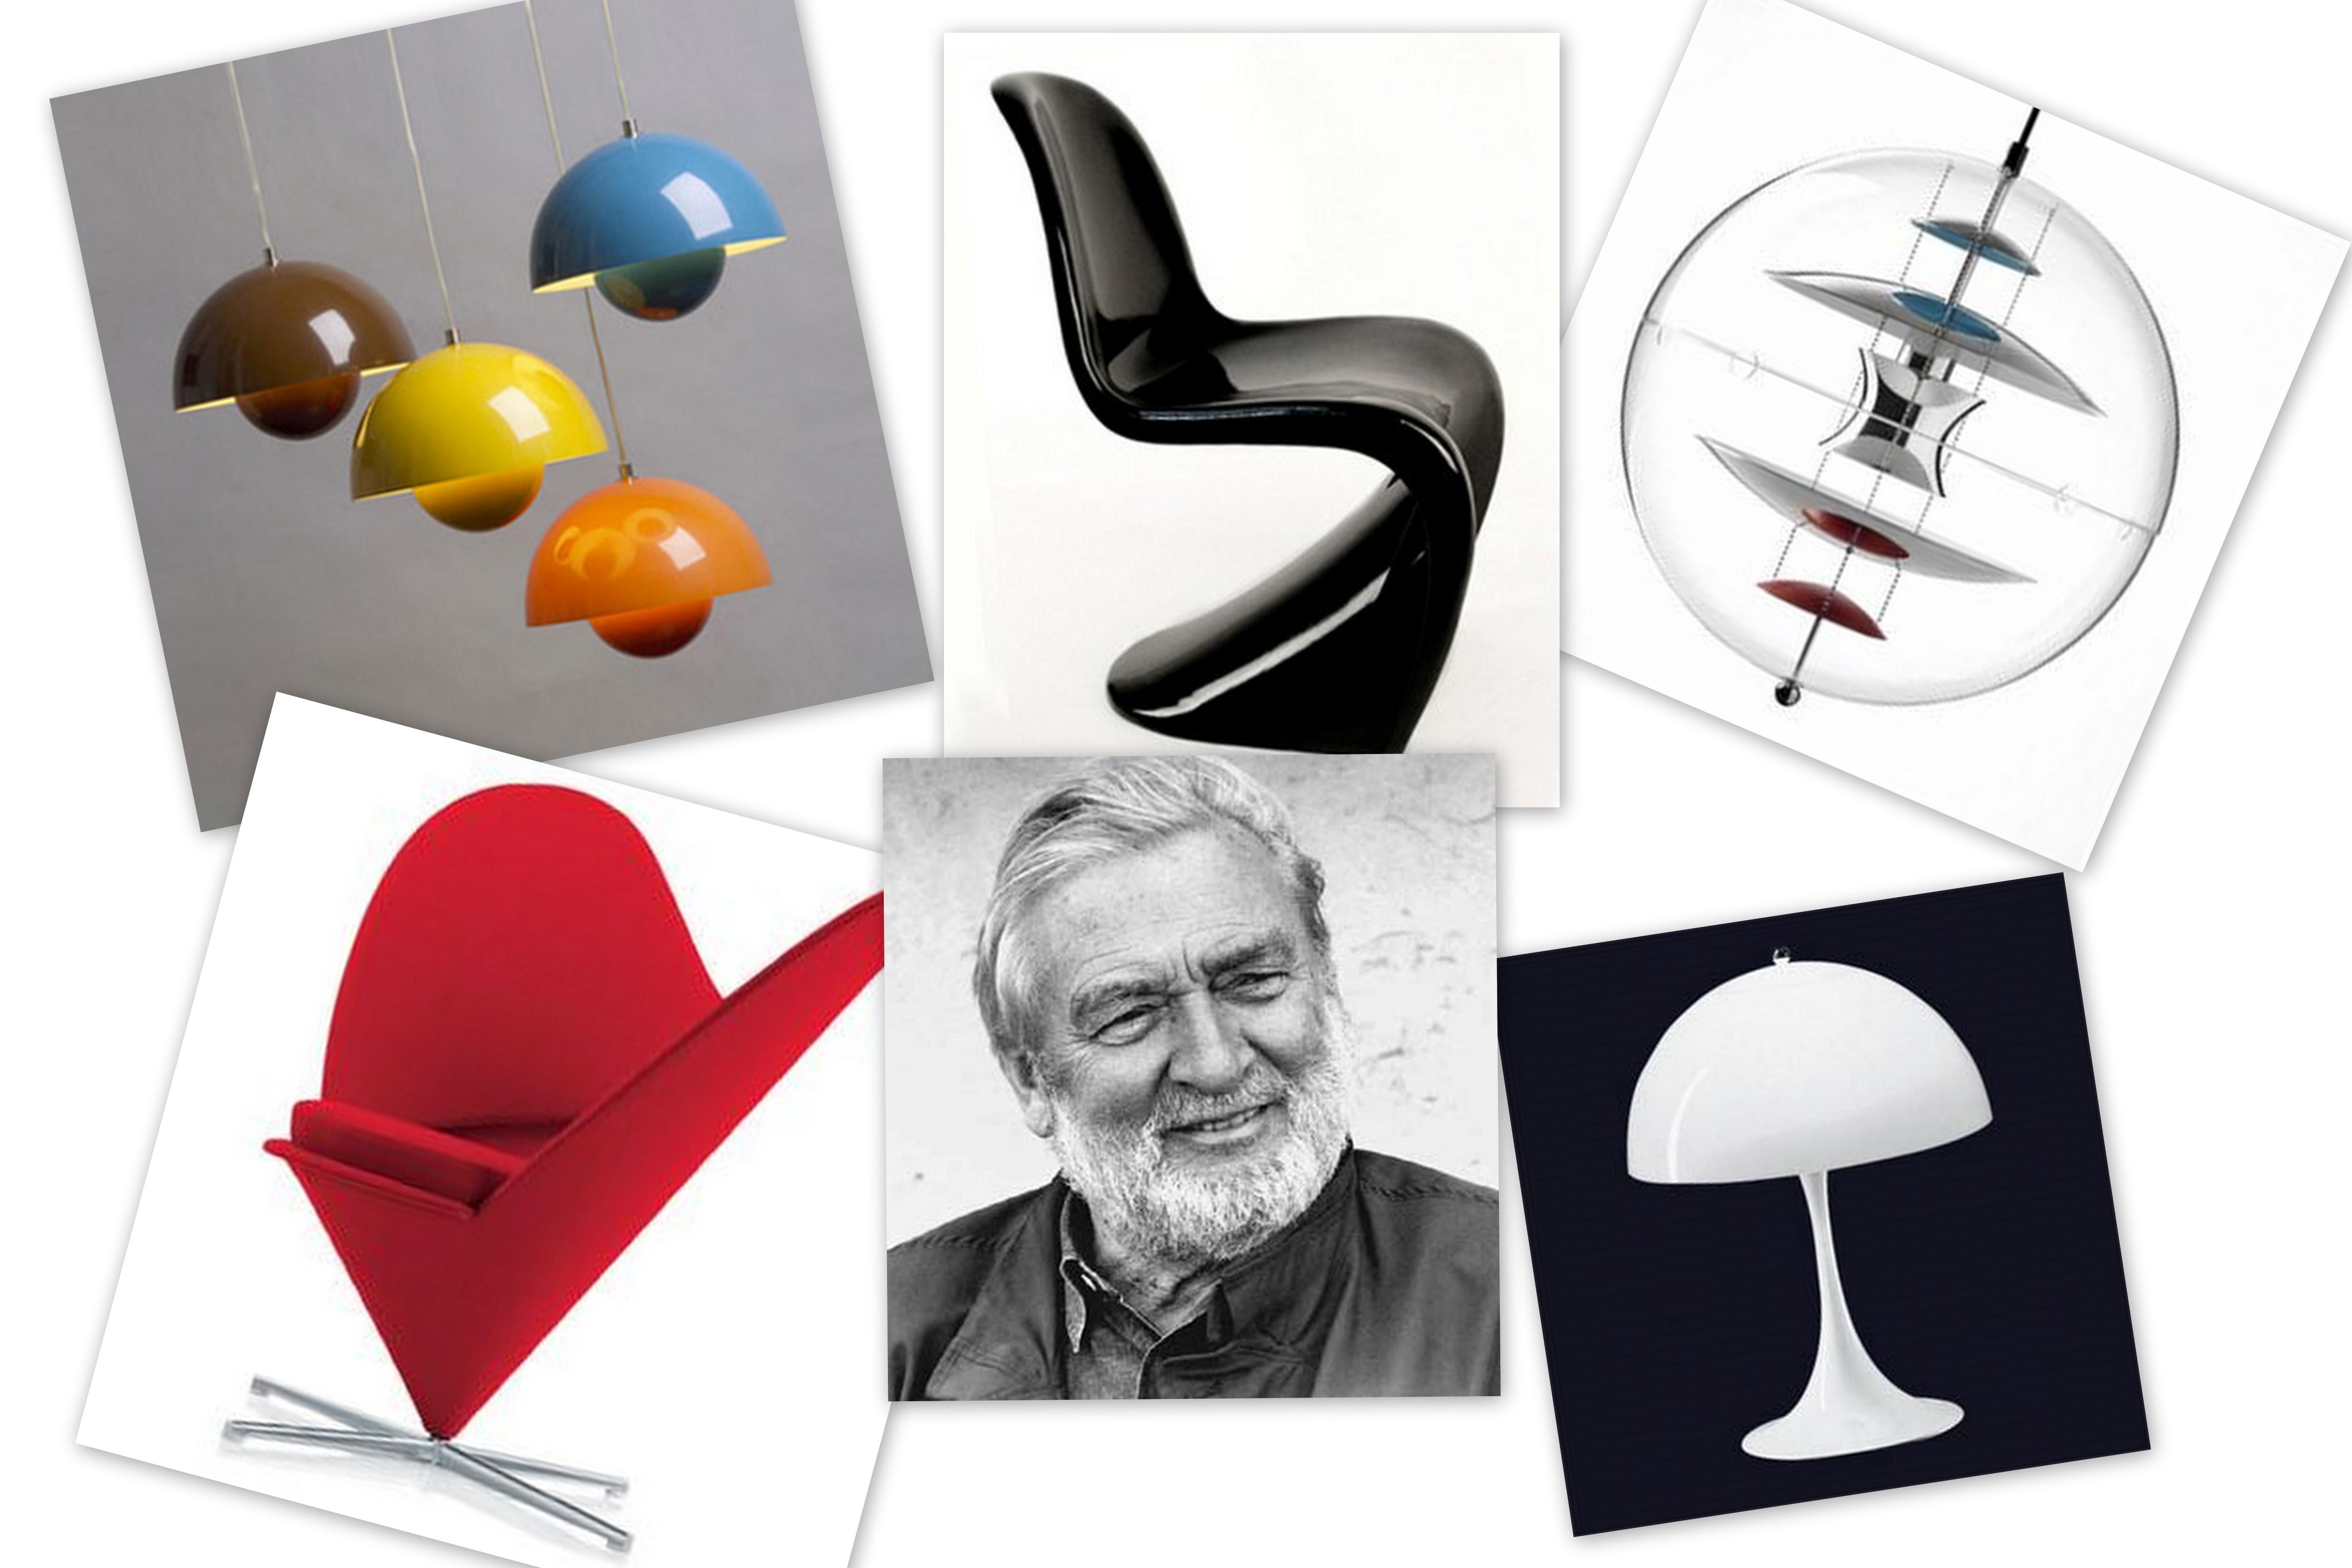 replica verner panton fun 0 dm lamp buy in online shop price order online. Black Bedroom Furniture Sets. Home Design Ideas